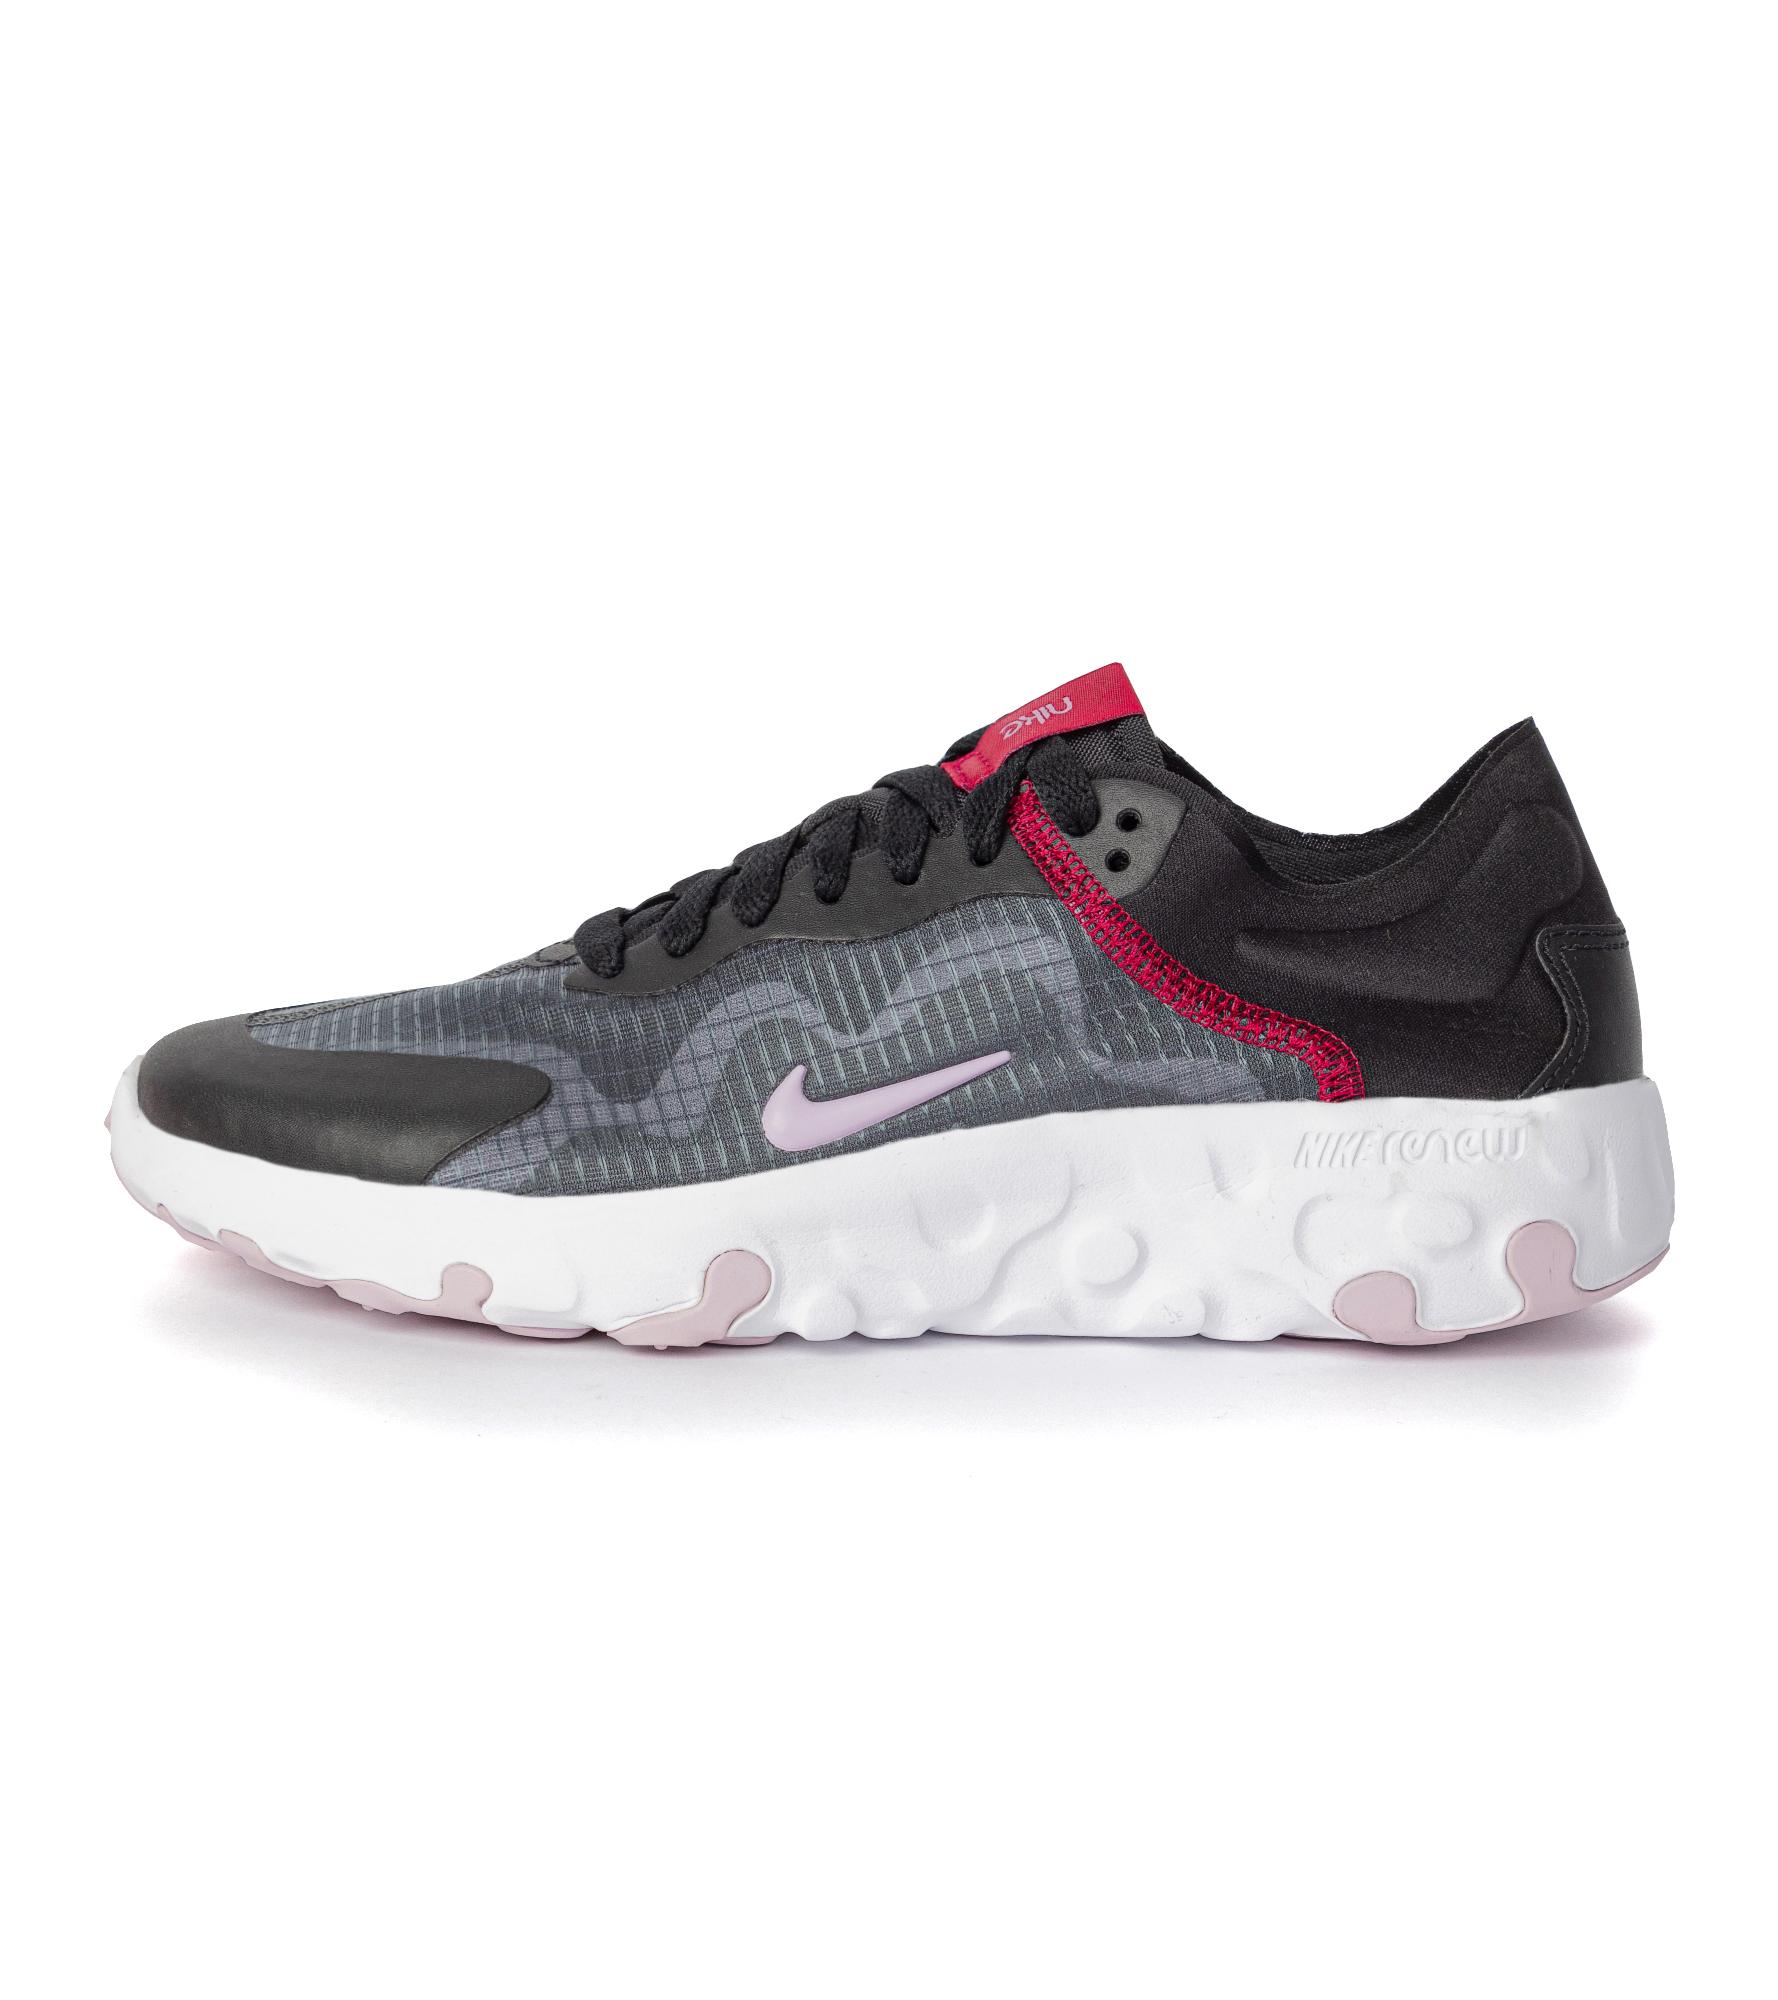 Nike Кроссовки женские Nike Renew Lucent, размер 37